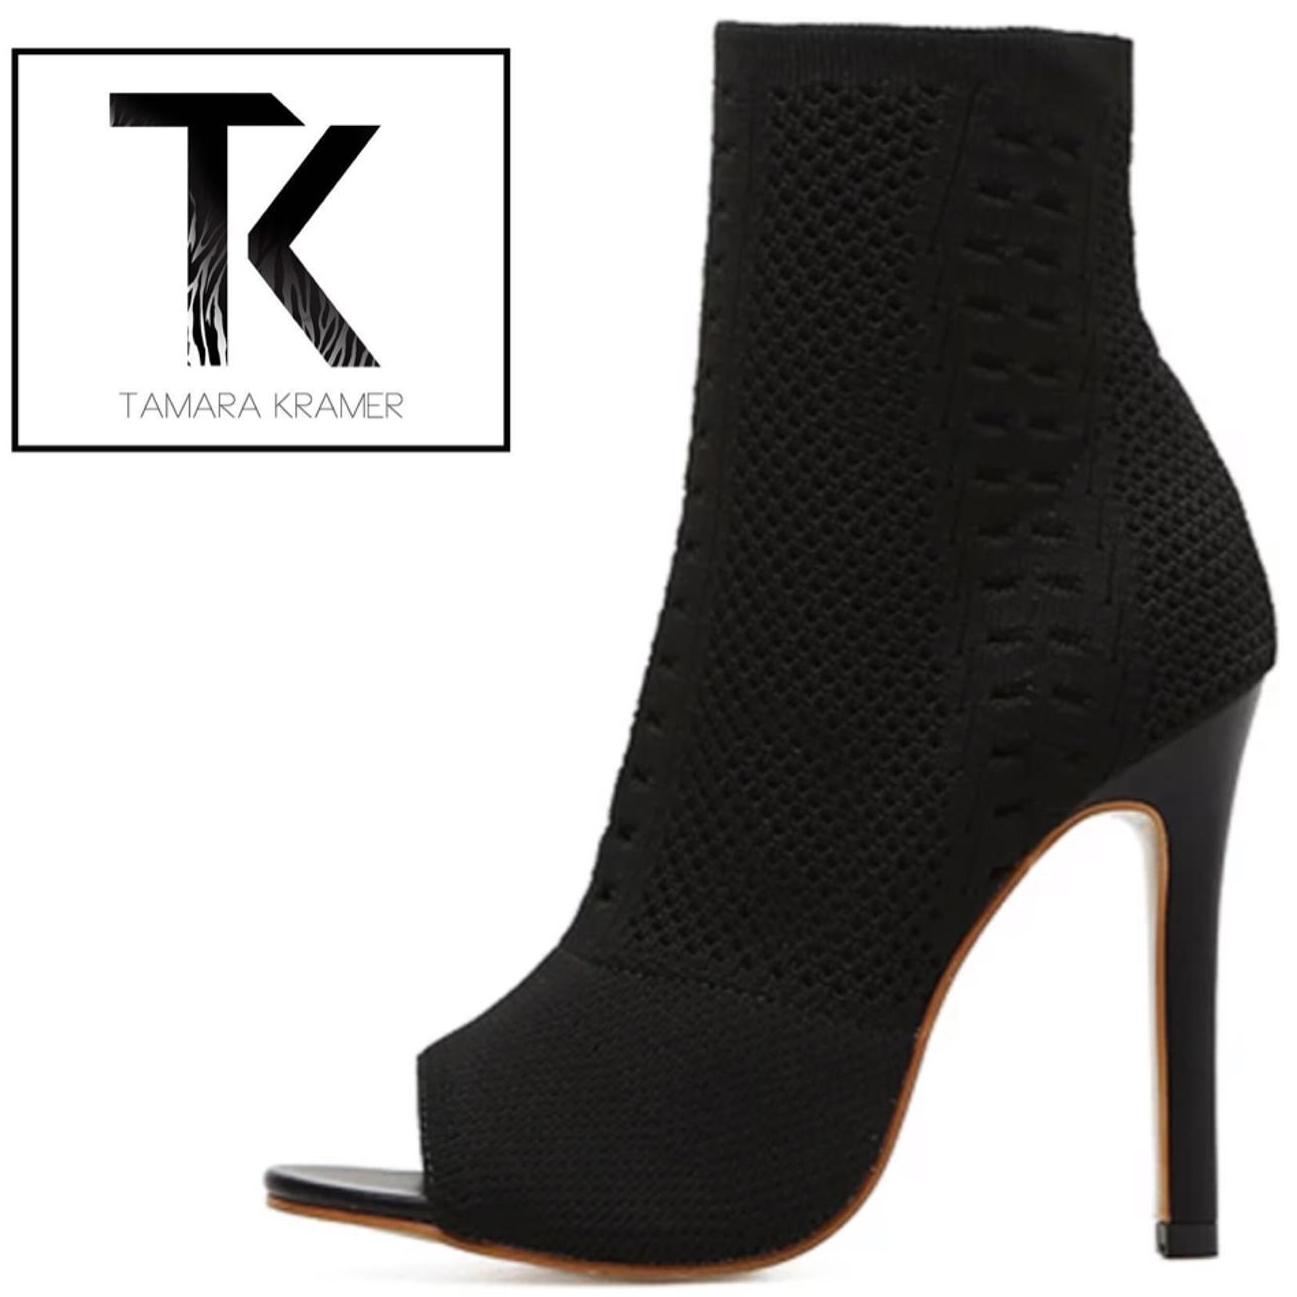 Tamara-Kramer-black-open-toe-heels